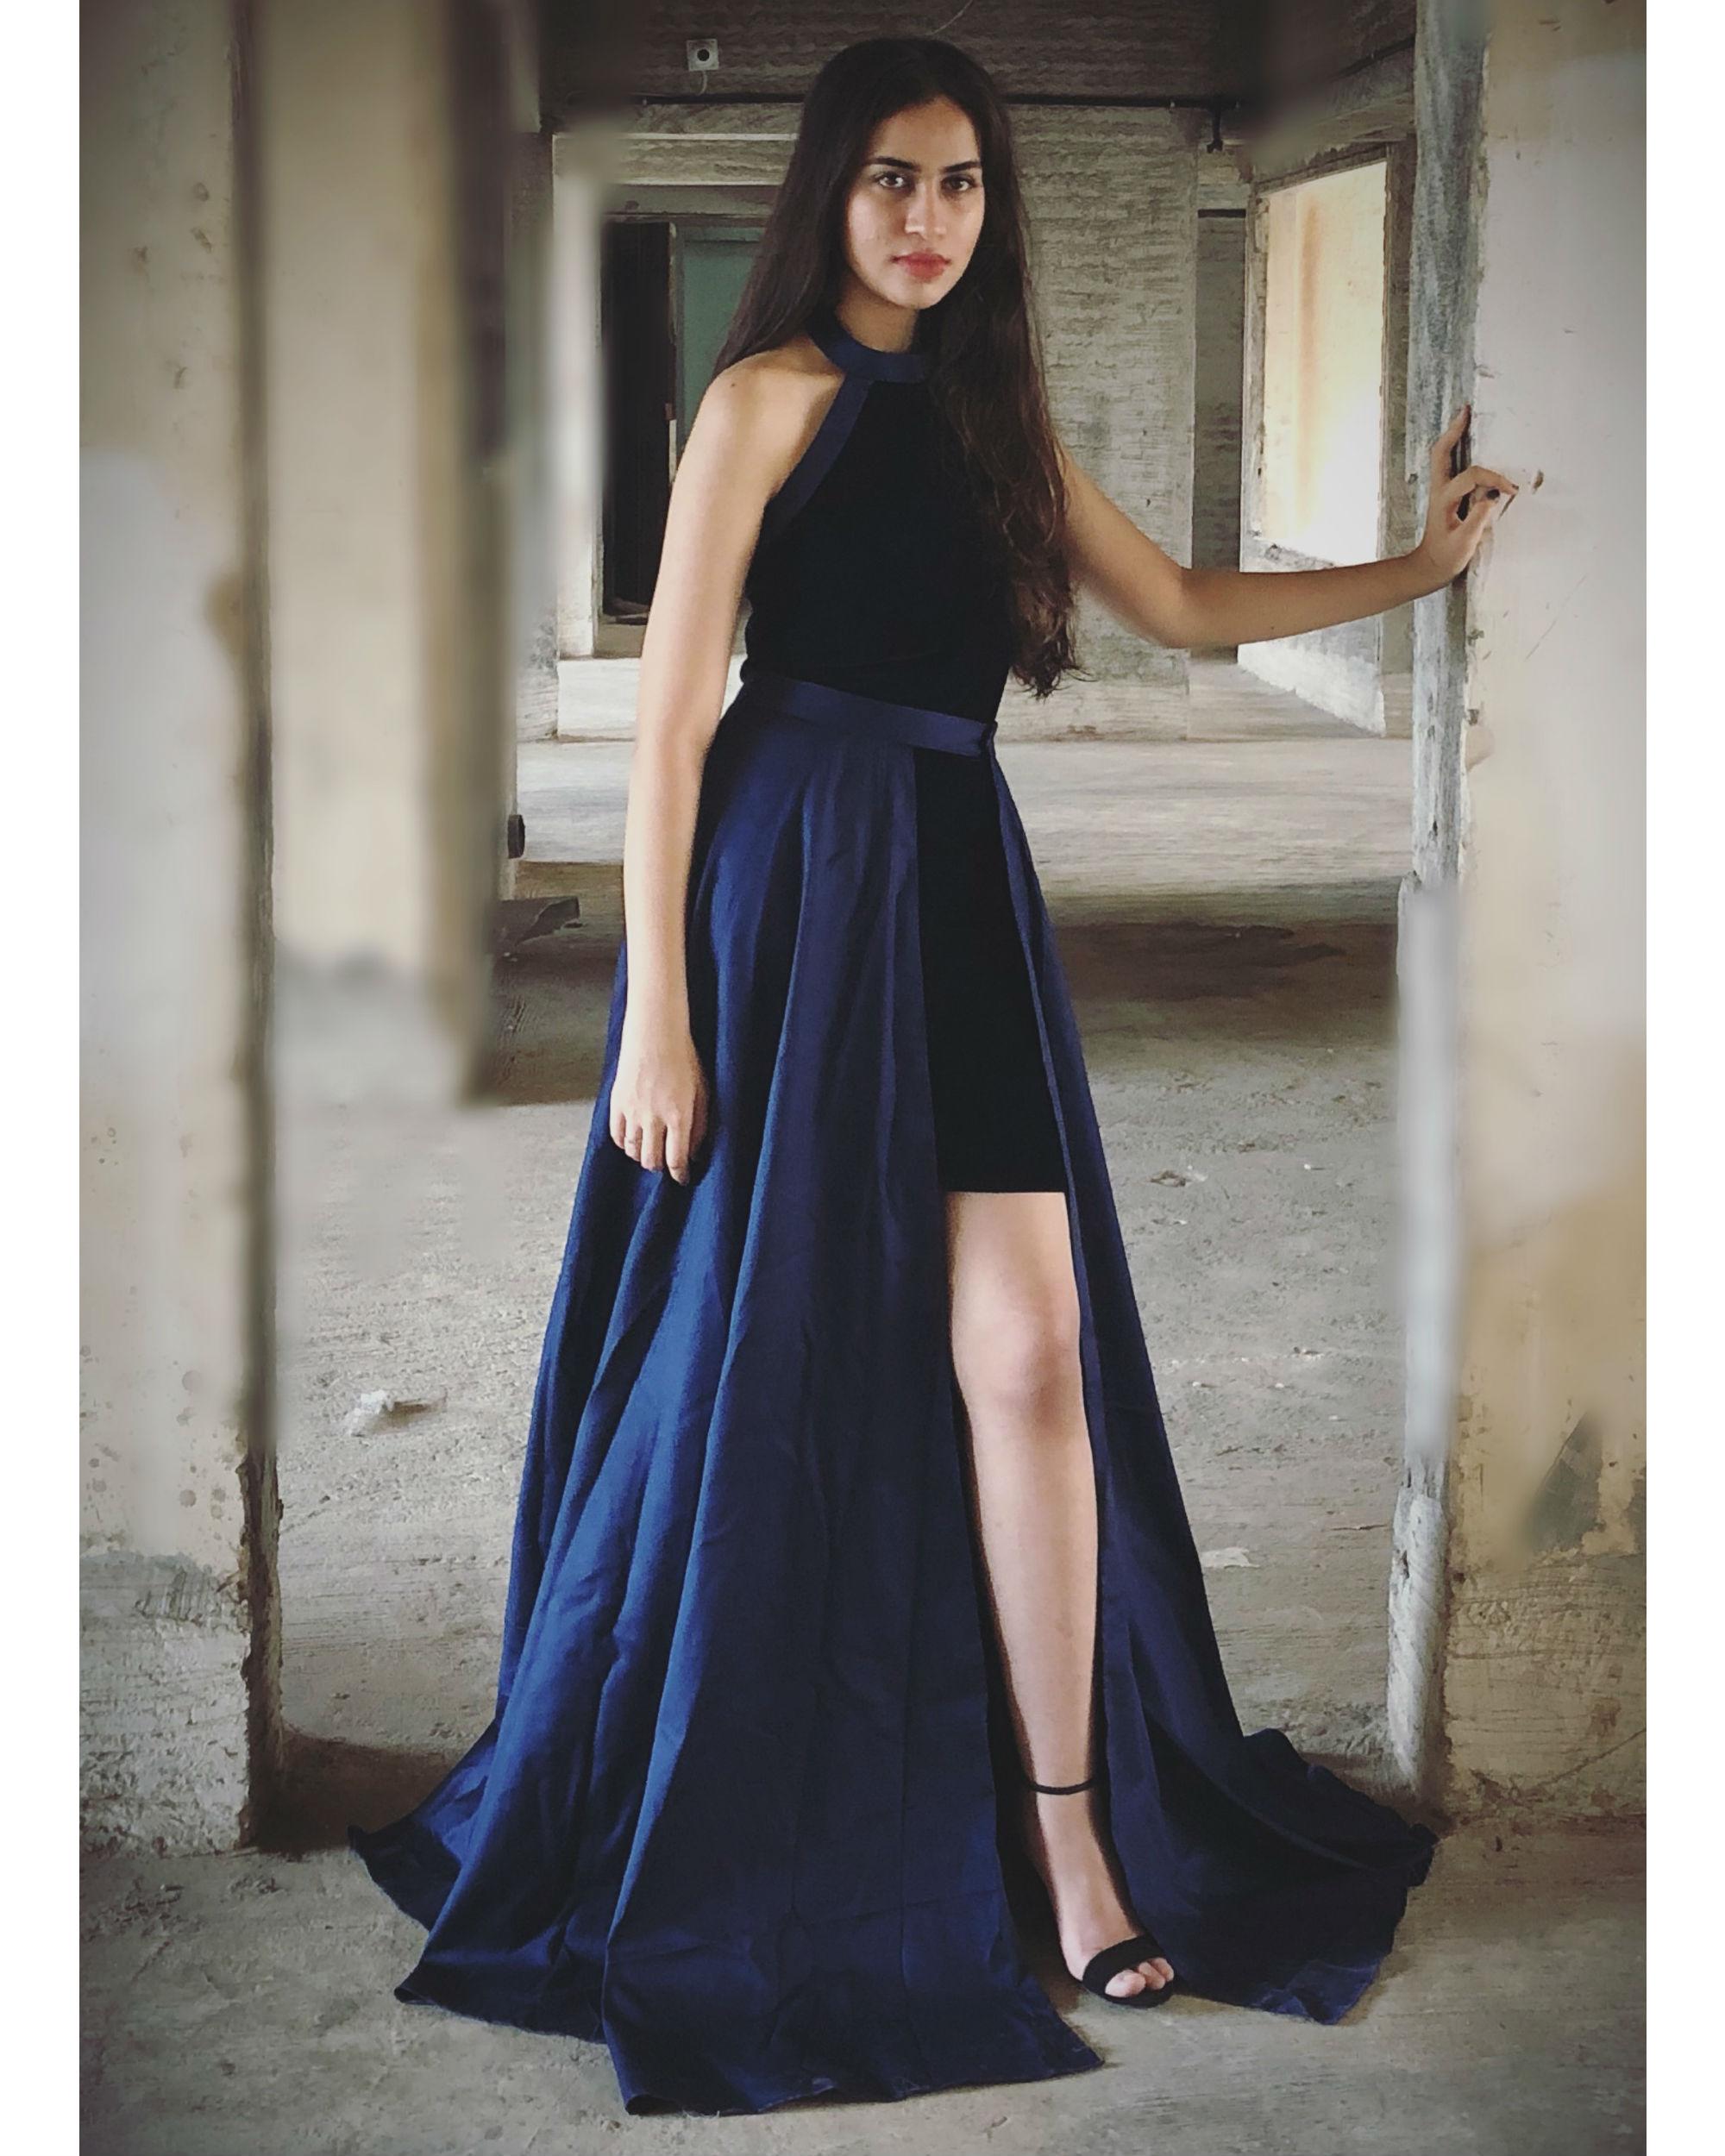 Navy Blue Velvet and twilight blue maxi dress